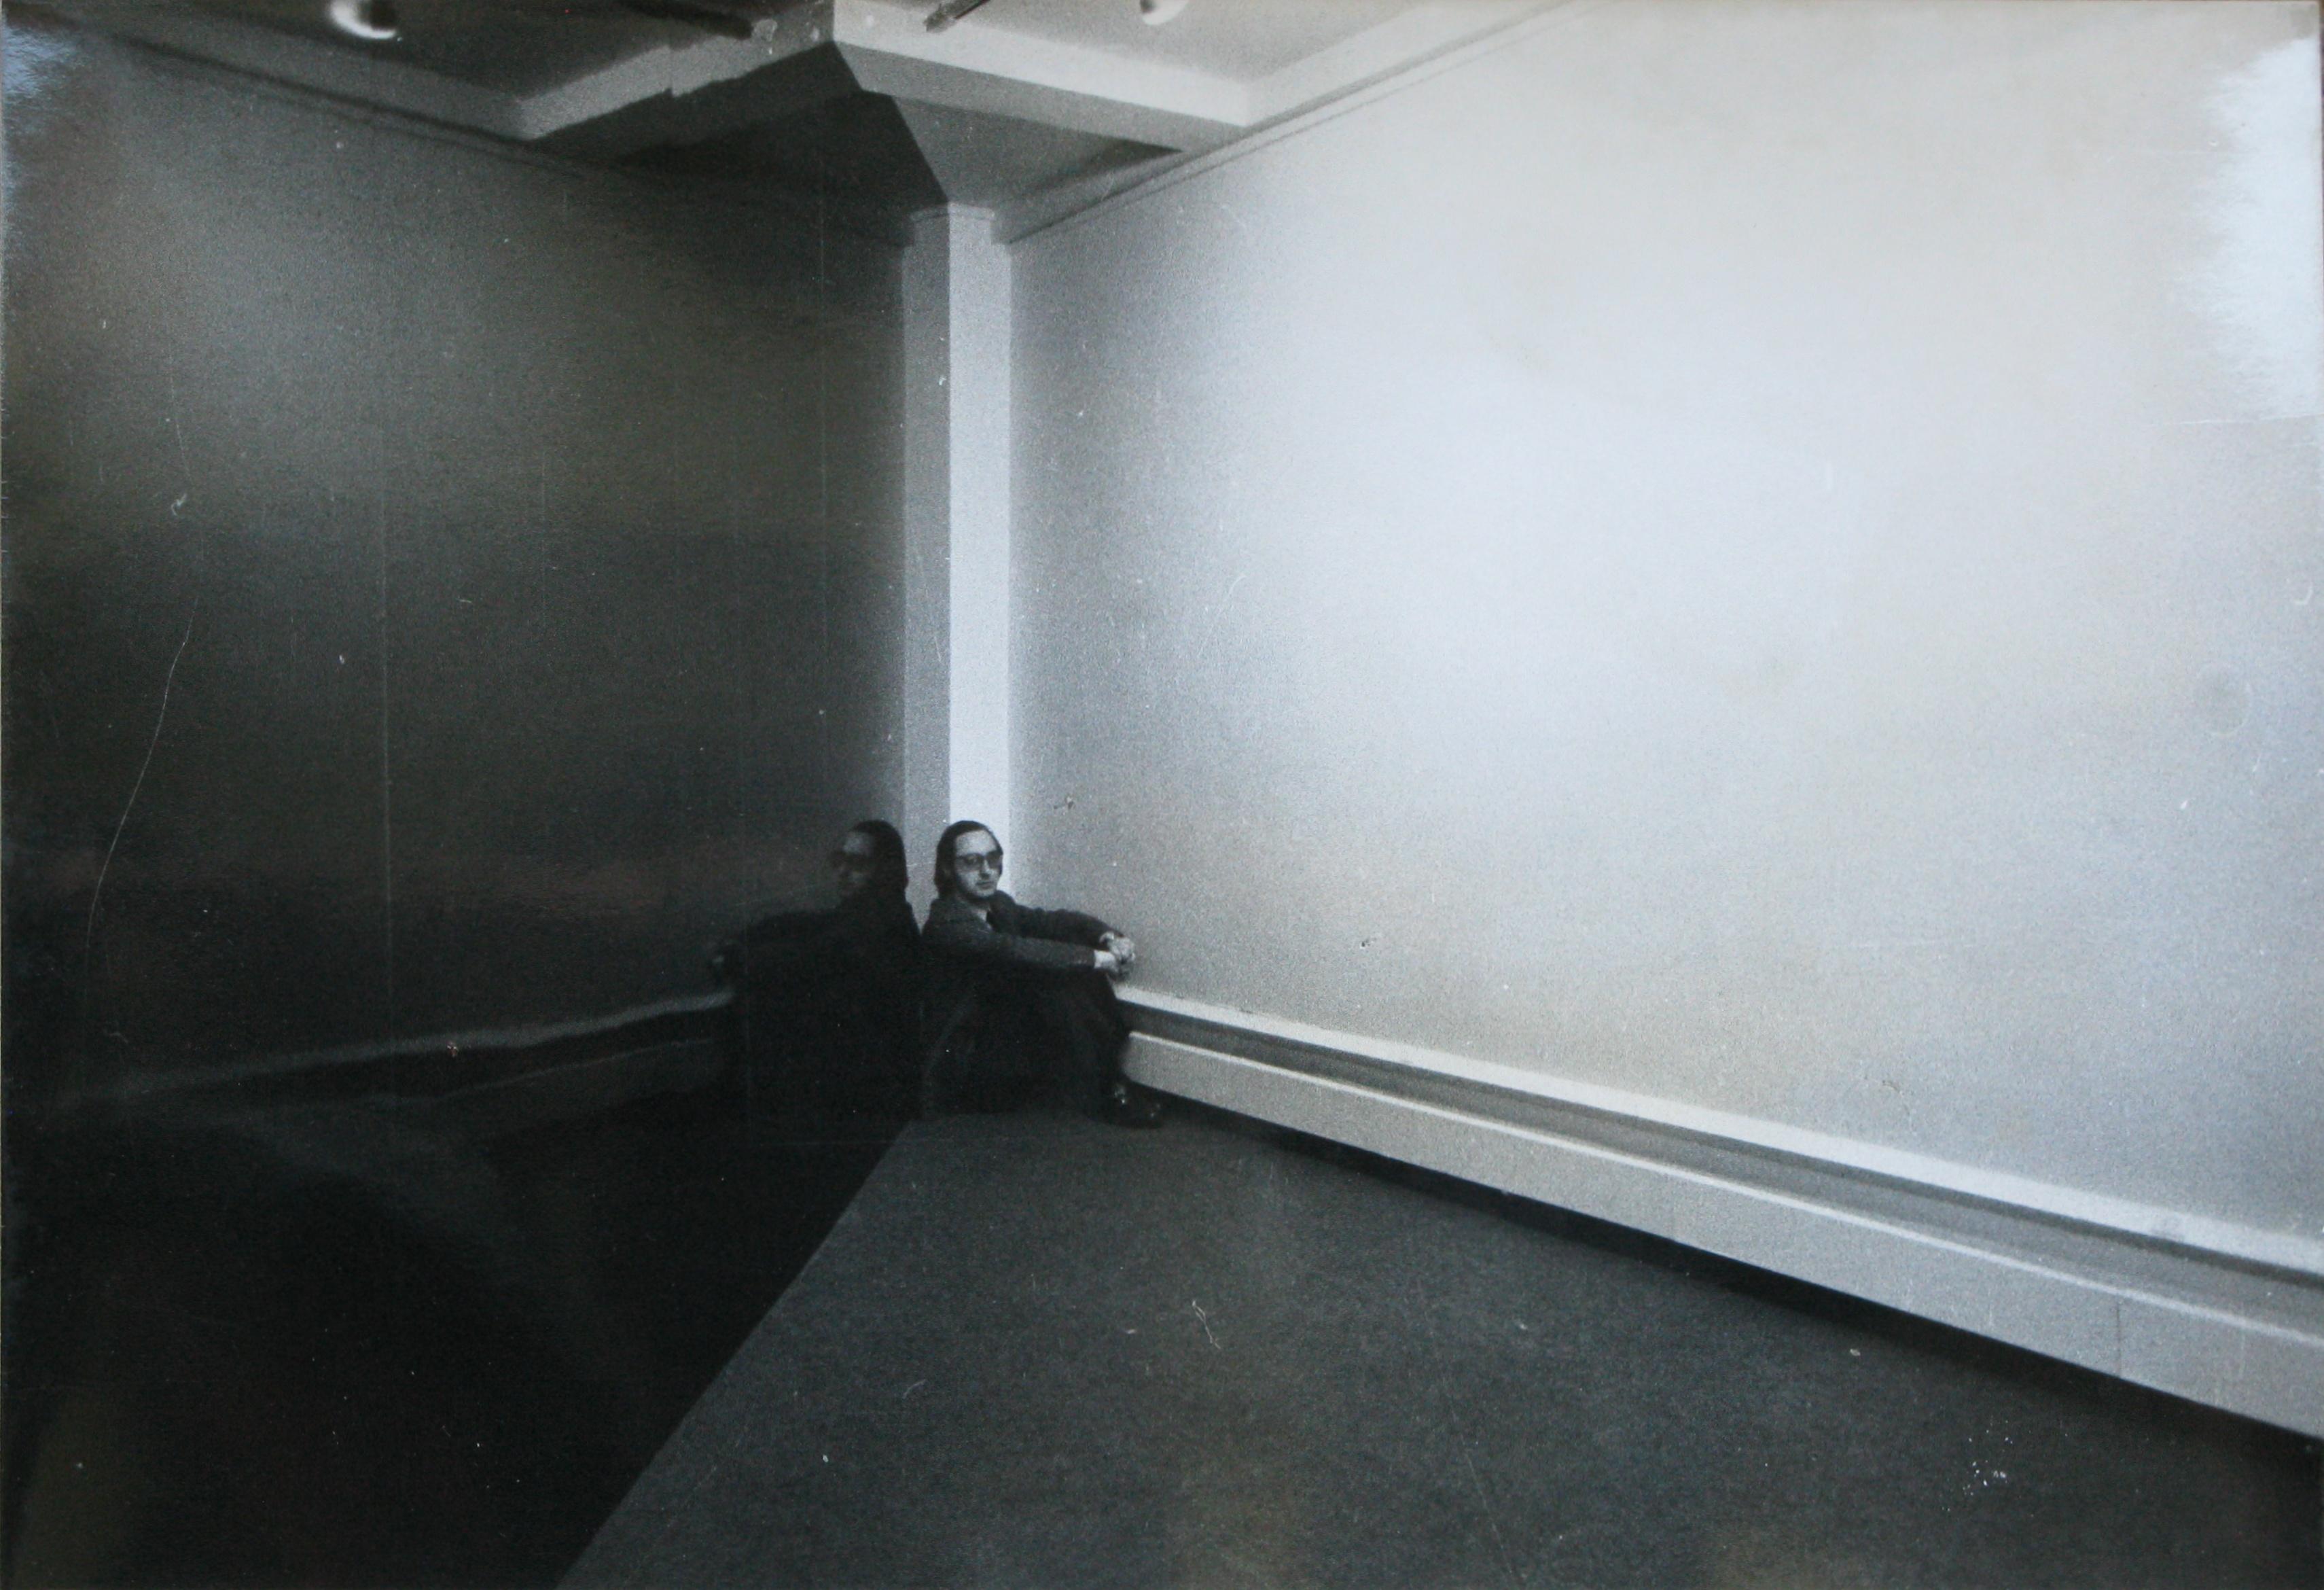 Jean-Michel Sanejouand dans l'Organisation d'espaces n°2, Galerie Yvon Lambert, 1967